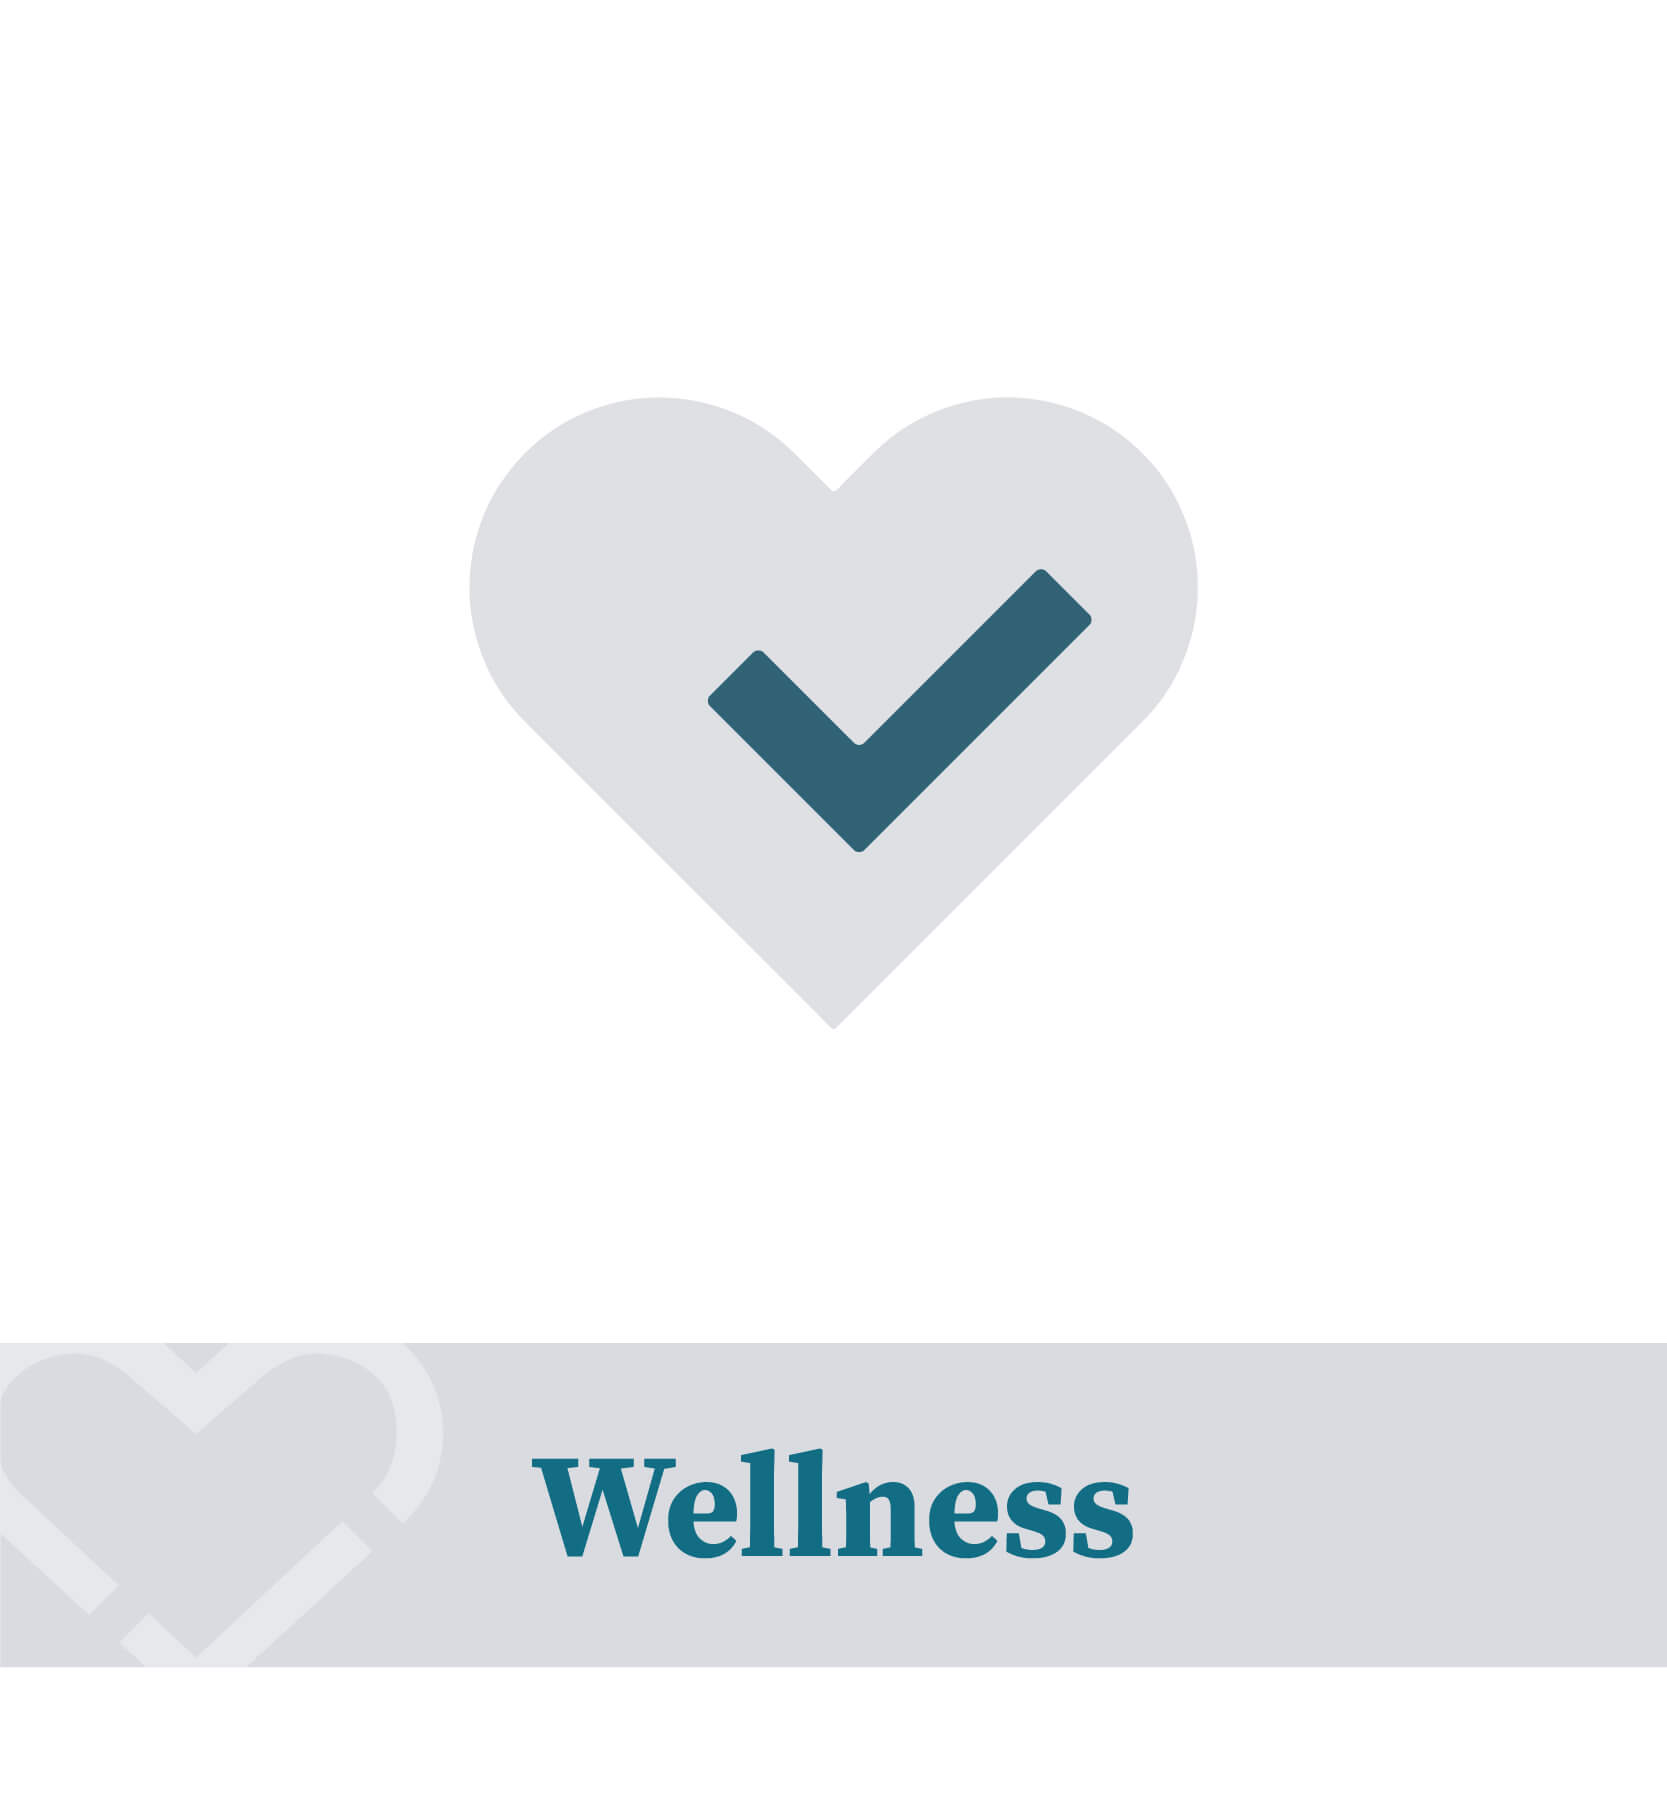 Wellness heart health logo